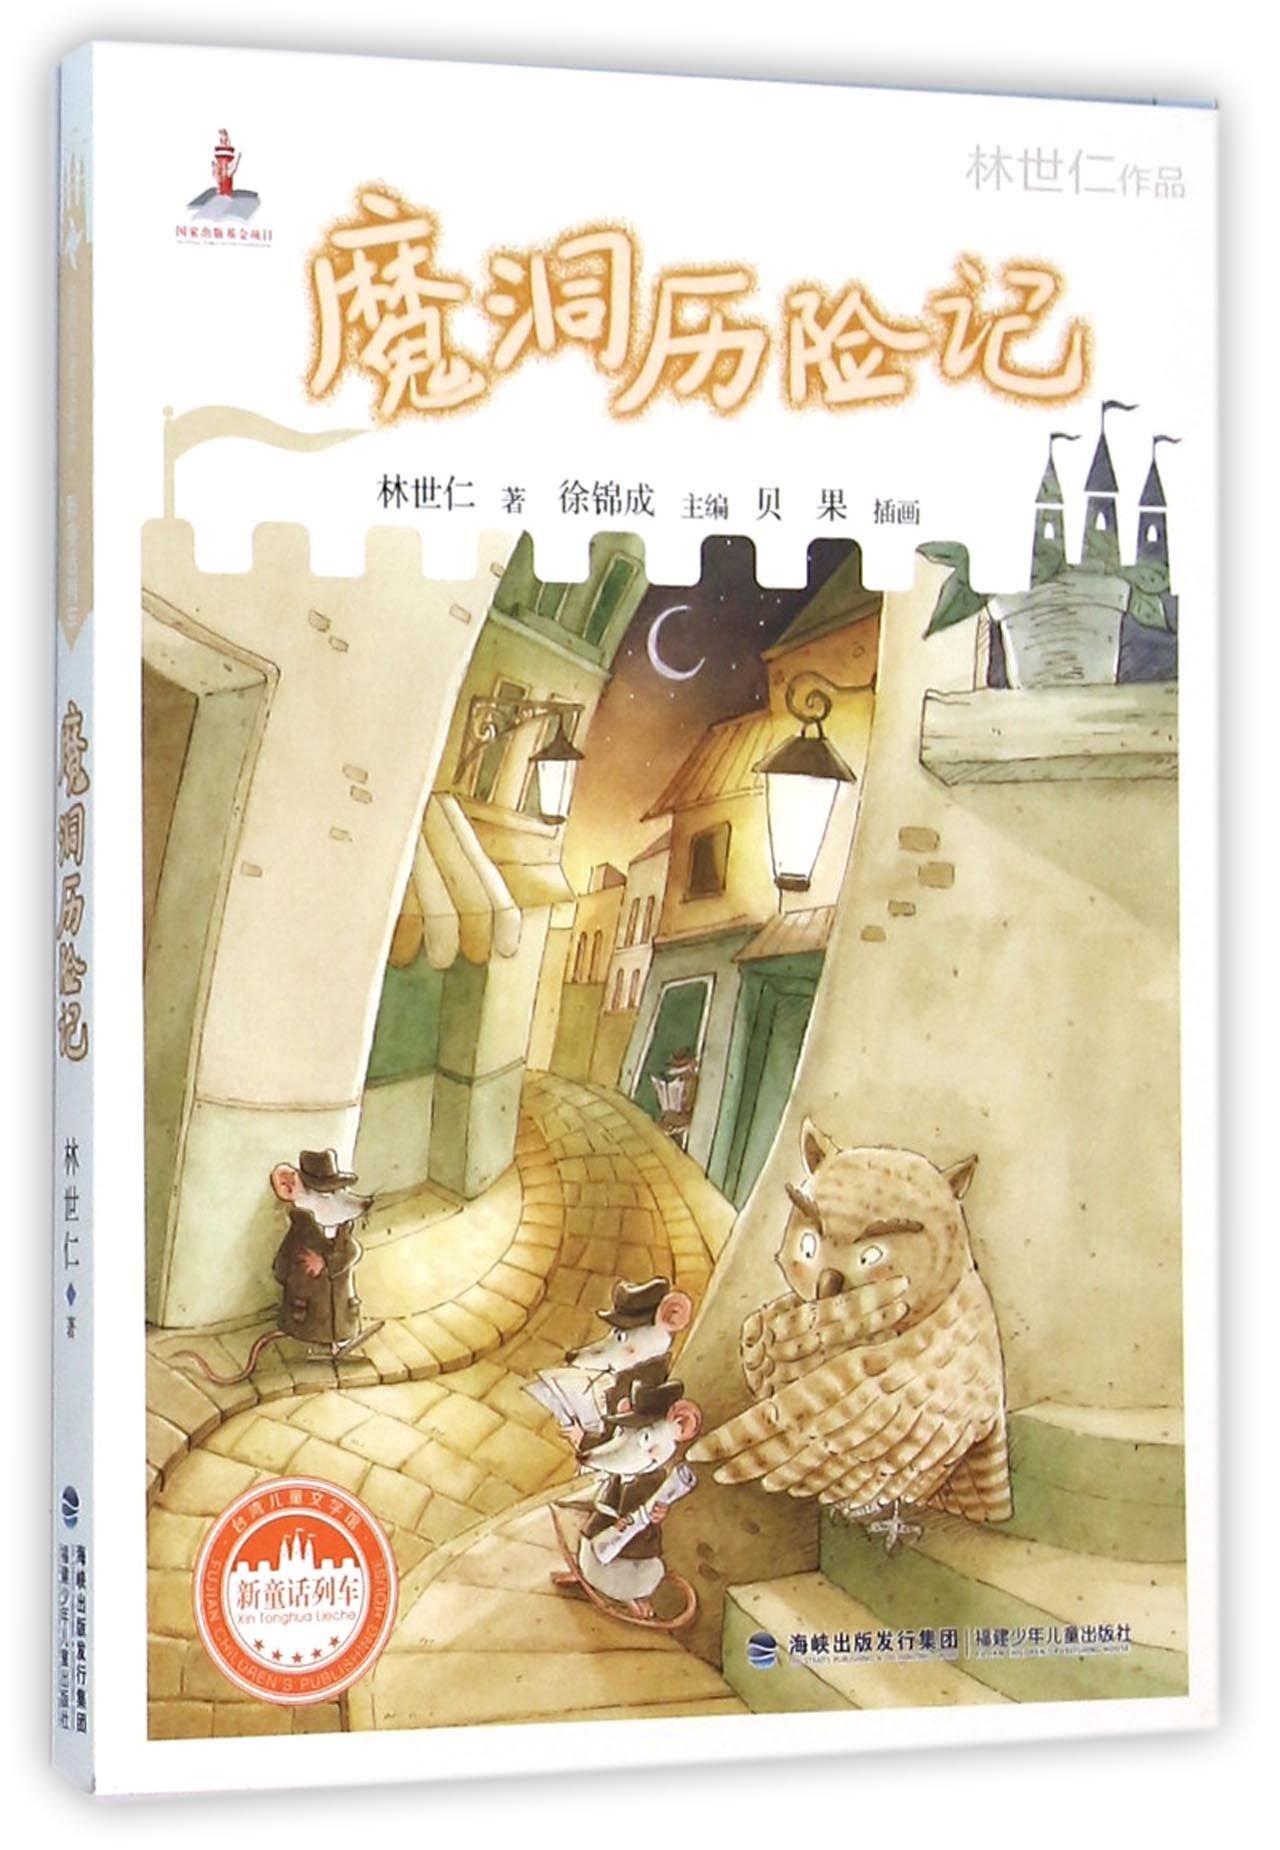 Adventure in the Magic Hole (Chinese Edition) pdf epub